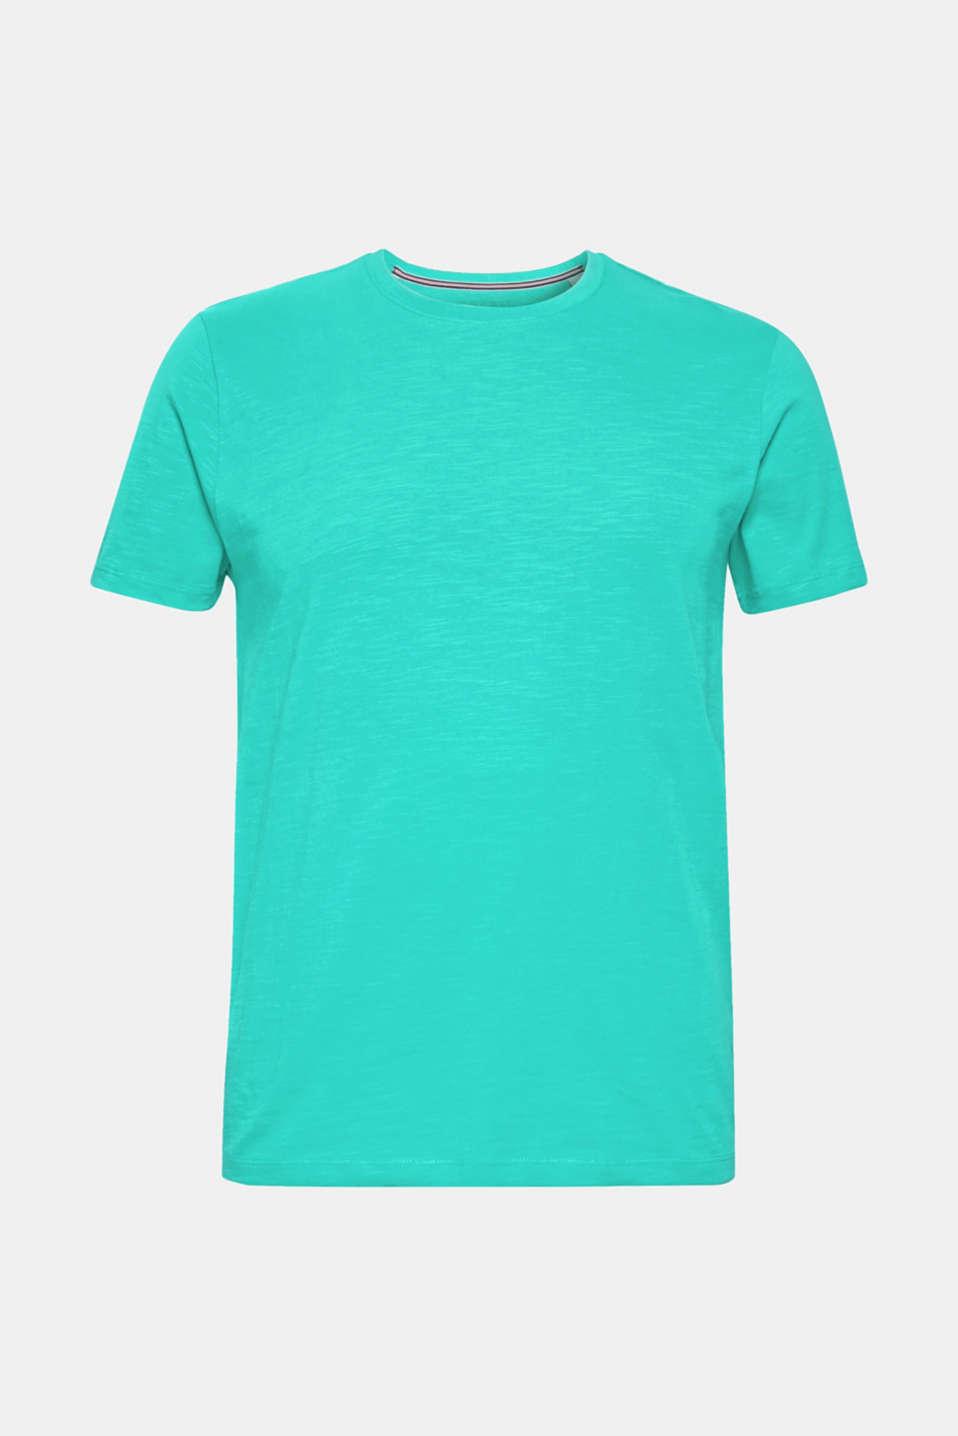 T-Shirts, AQUA GREEN, detail image number 8